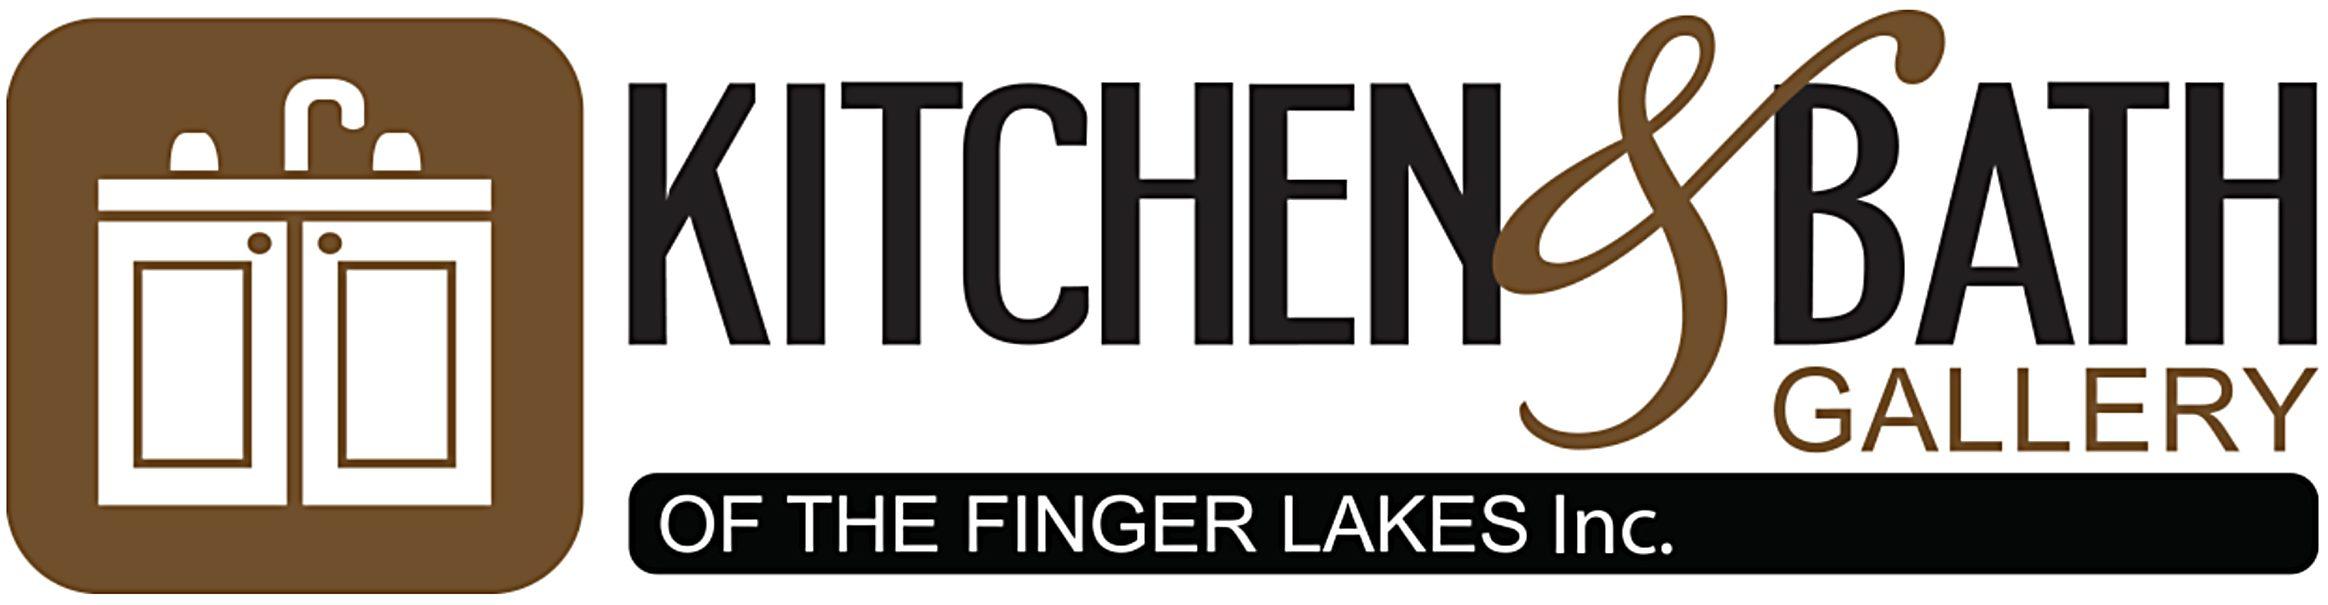 Kitchen and Bath Gallery